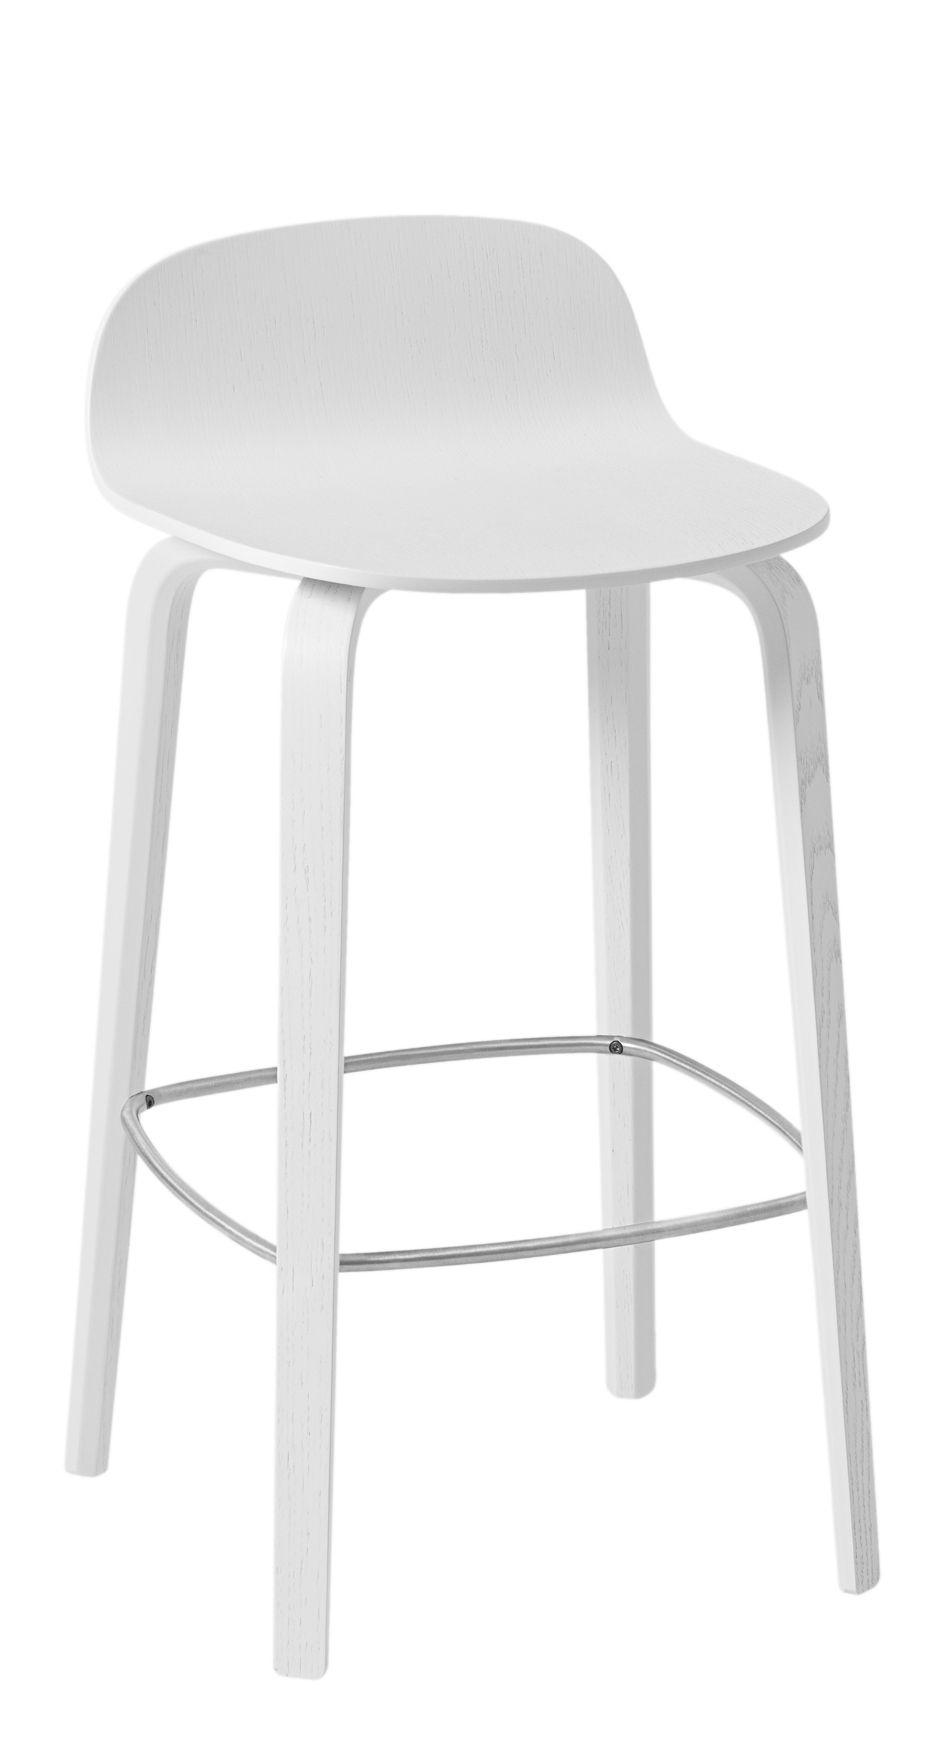 Visu Bar Stool Wood H 65 Cm White Steel Footrest By Muuto